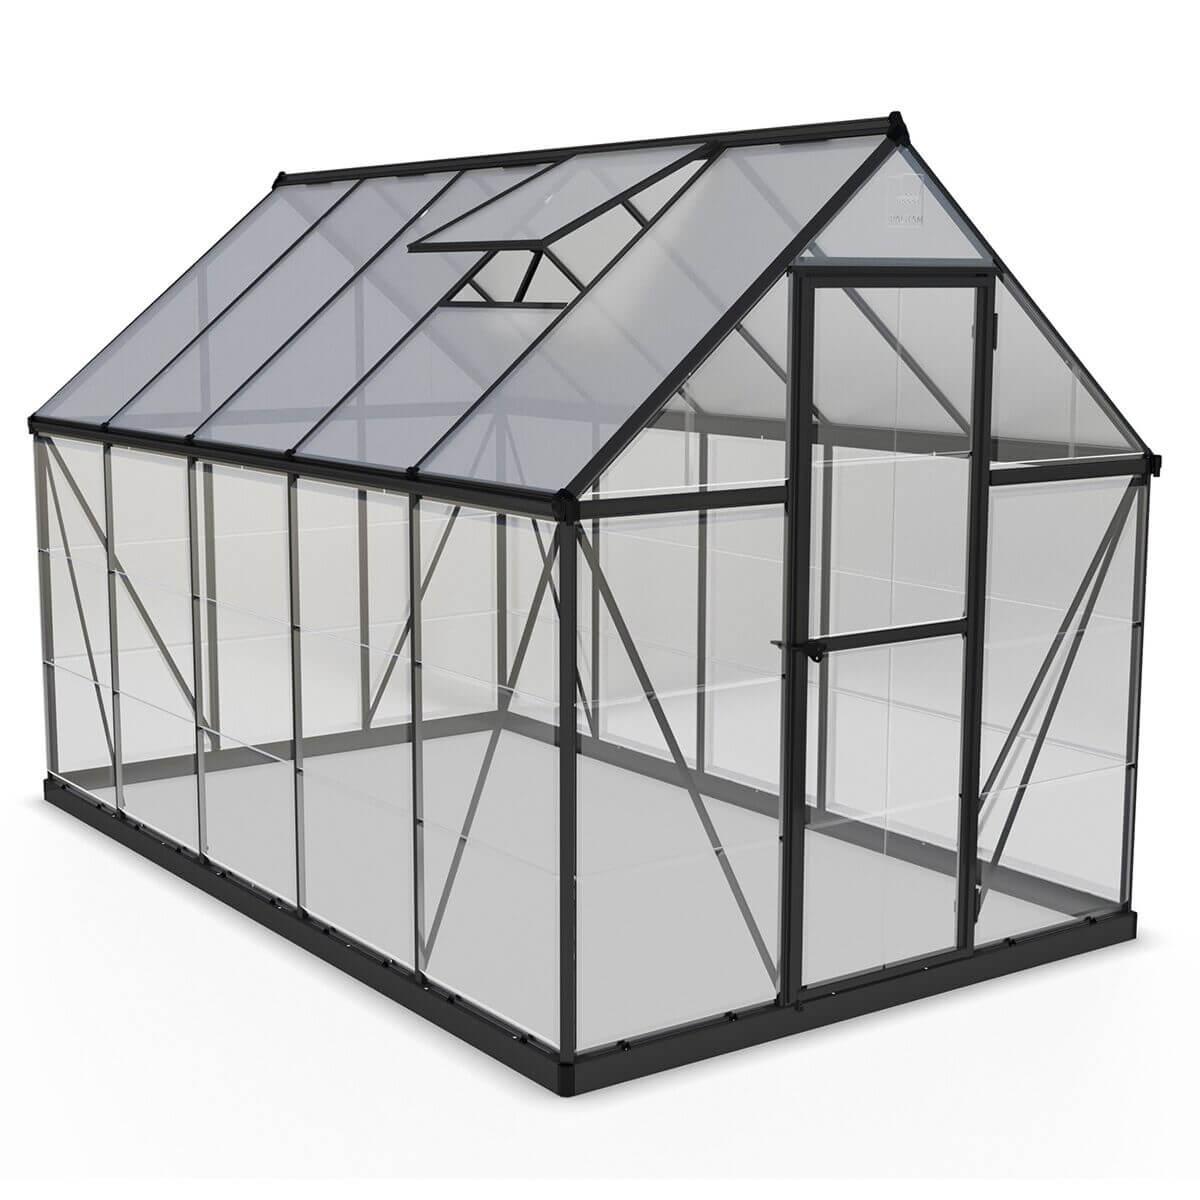 The Hybrid – A Palram Polycarbonate Greenhouse